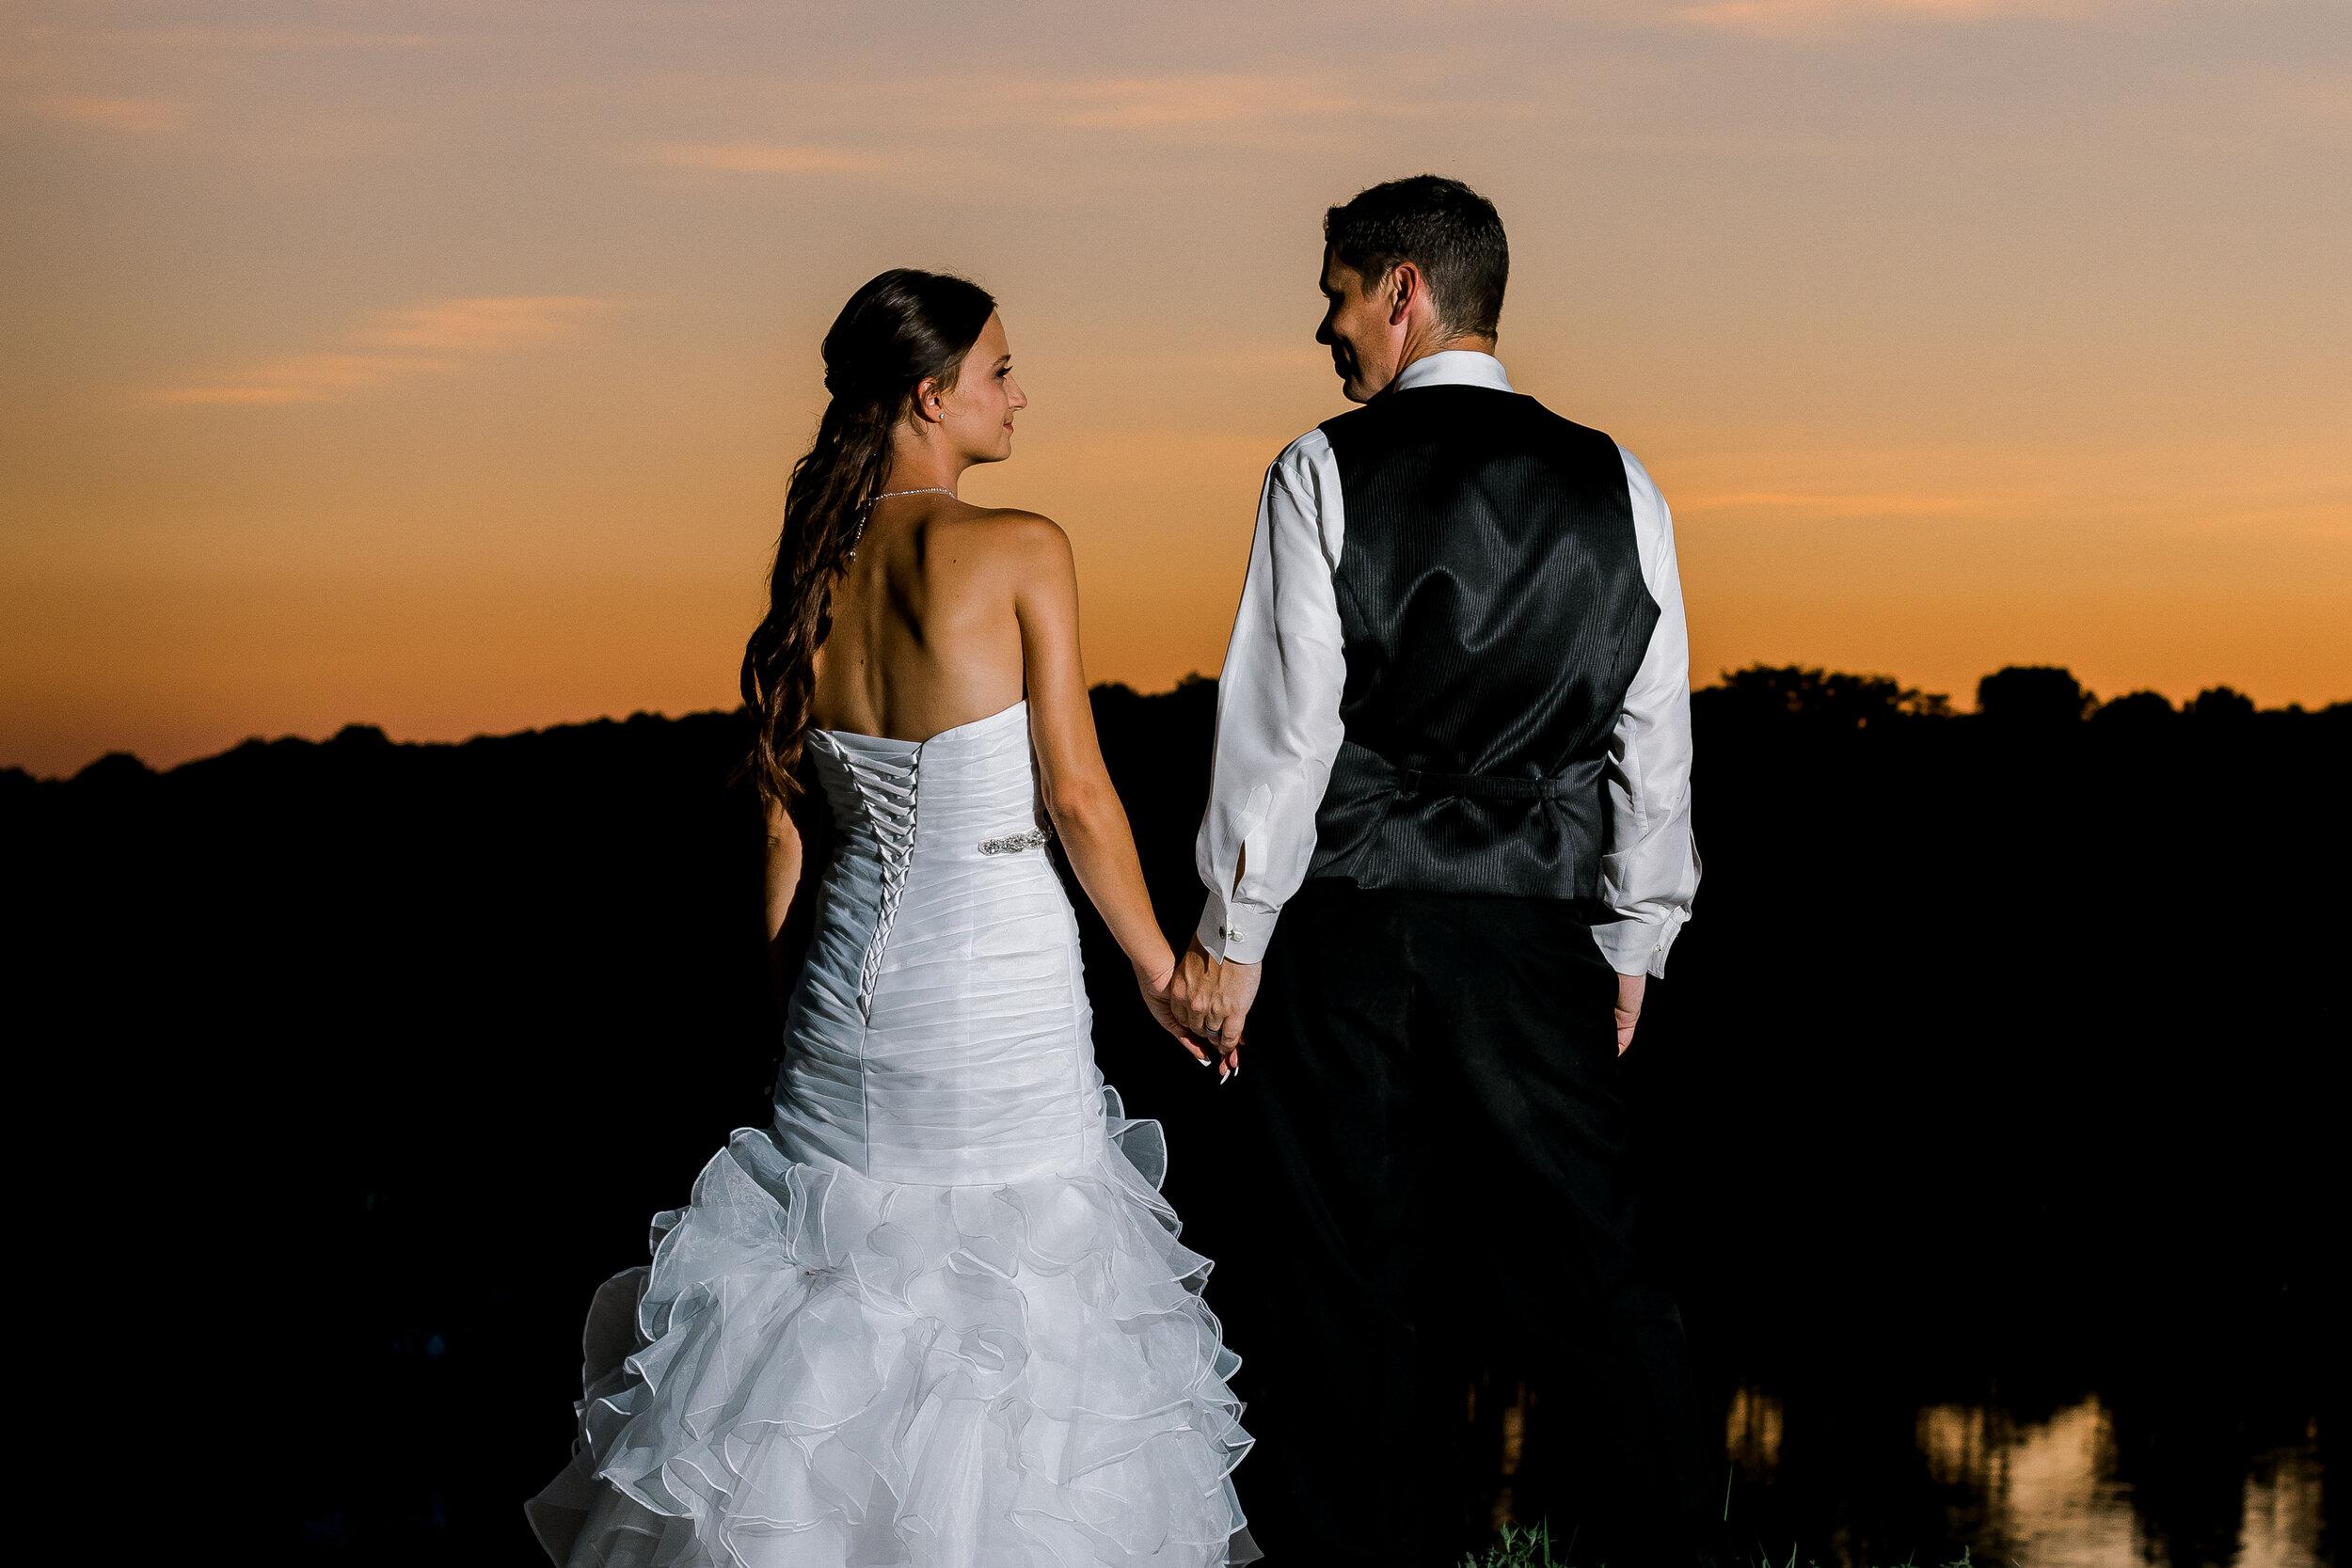 071319_Wedding_Amber_Stephen (11 of 11).jpg